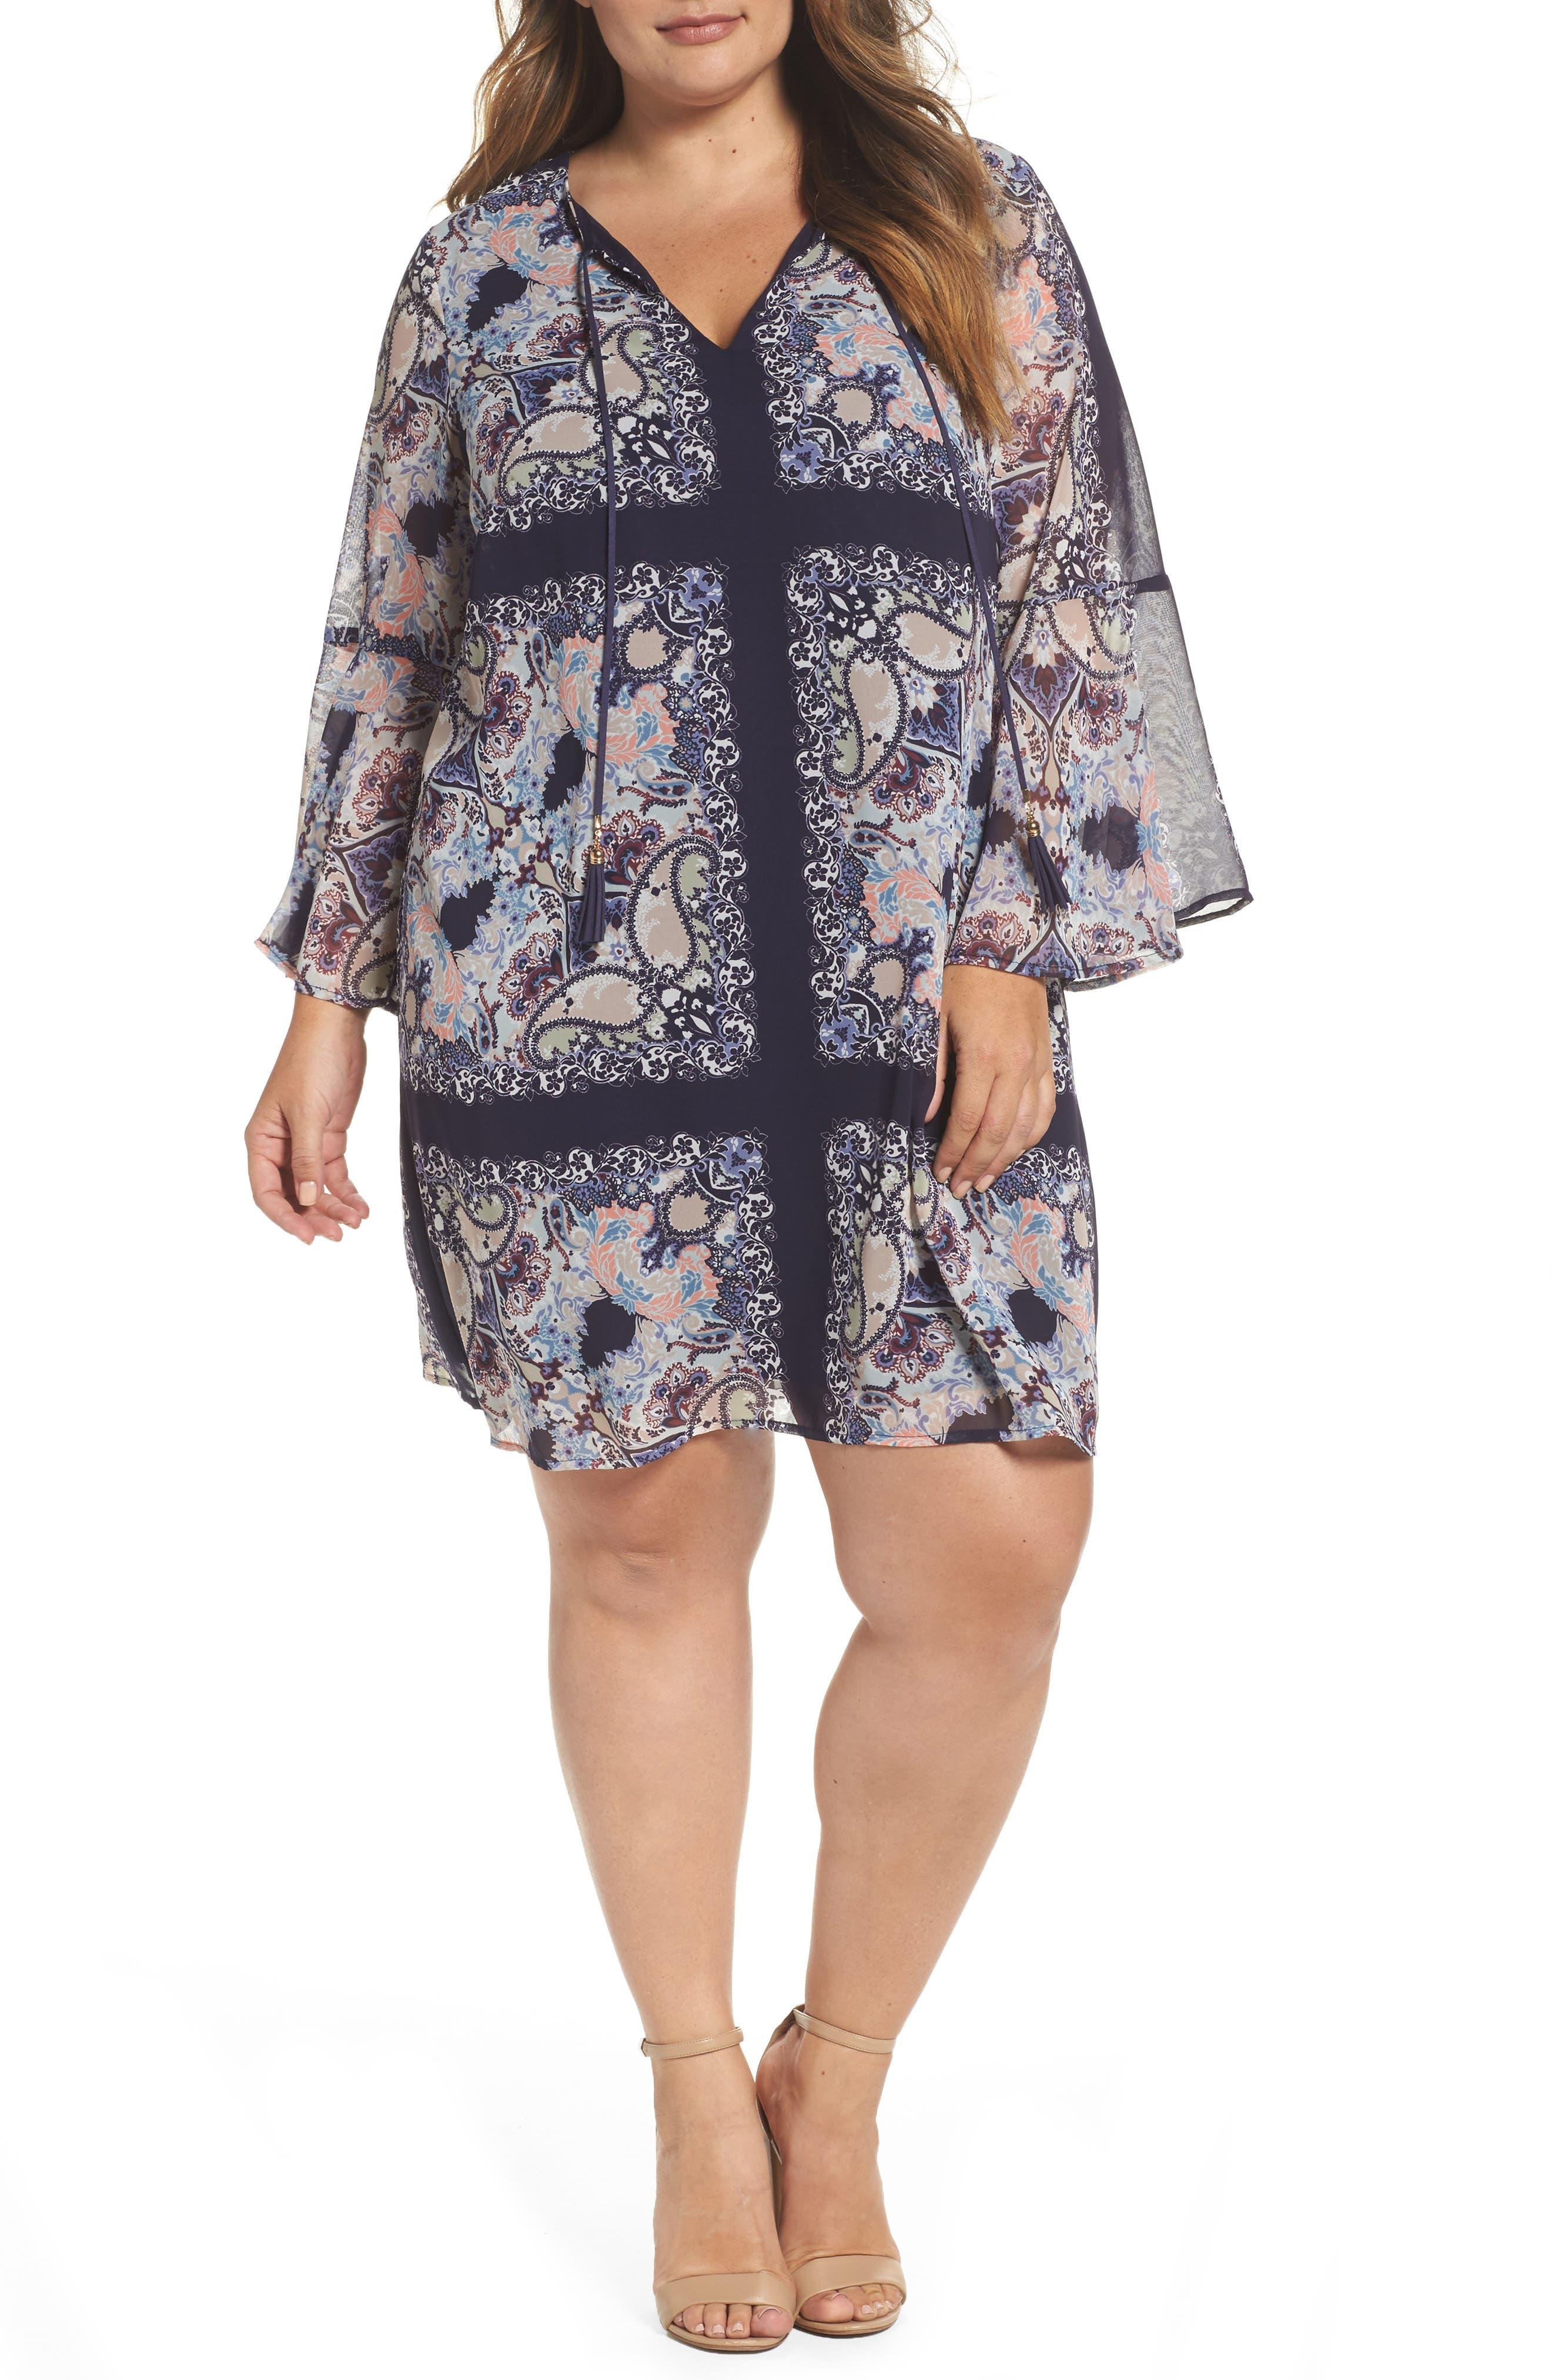 Vince Camuto Print Chiffon Bell Sleeve Shift Dress (Plus Size)